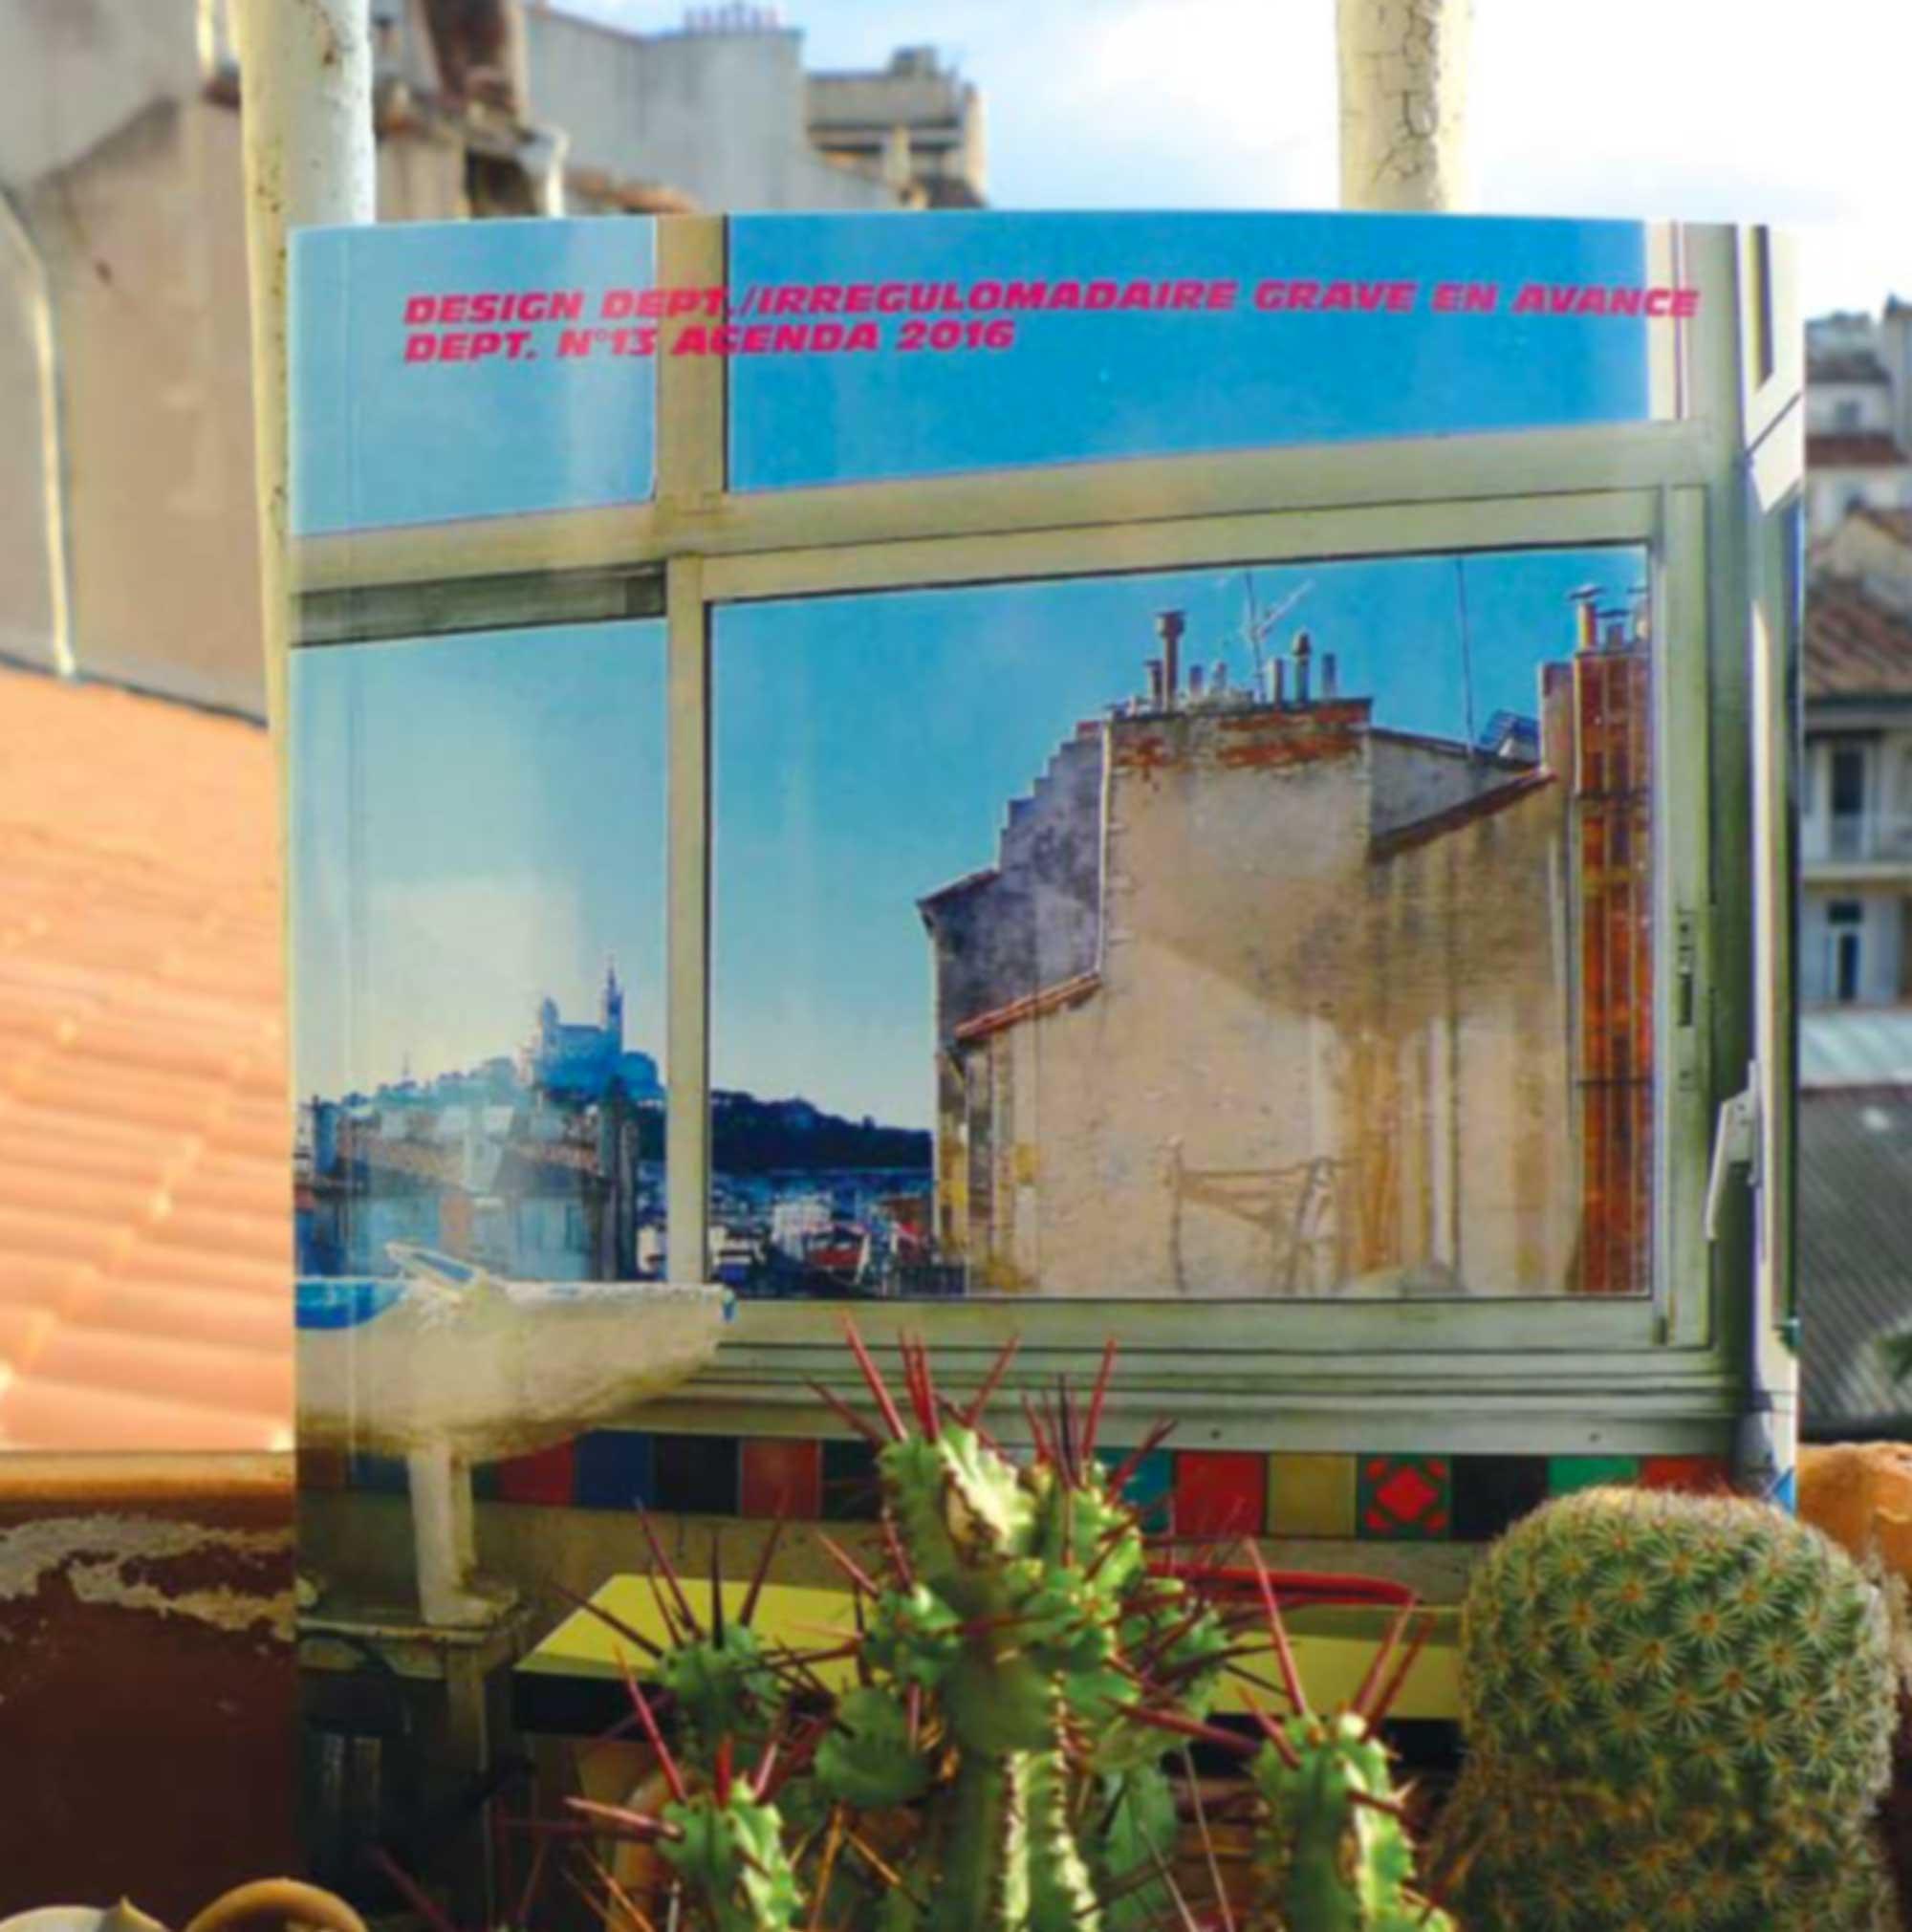 irregulomadaire agenda 2016 en avance design dept. Susanna Shannon n°13 Marseille